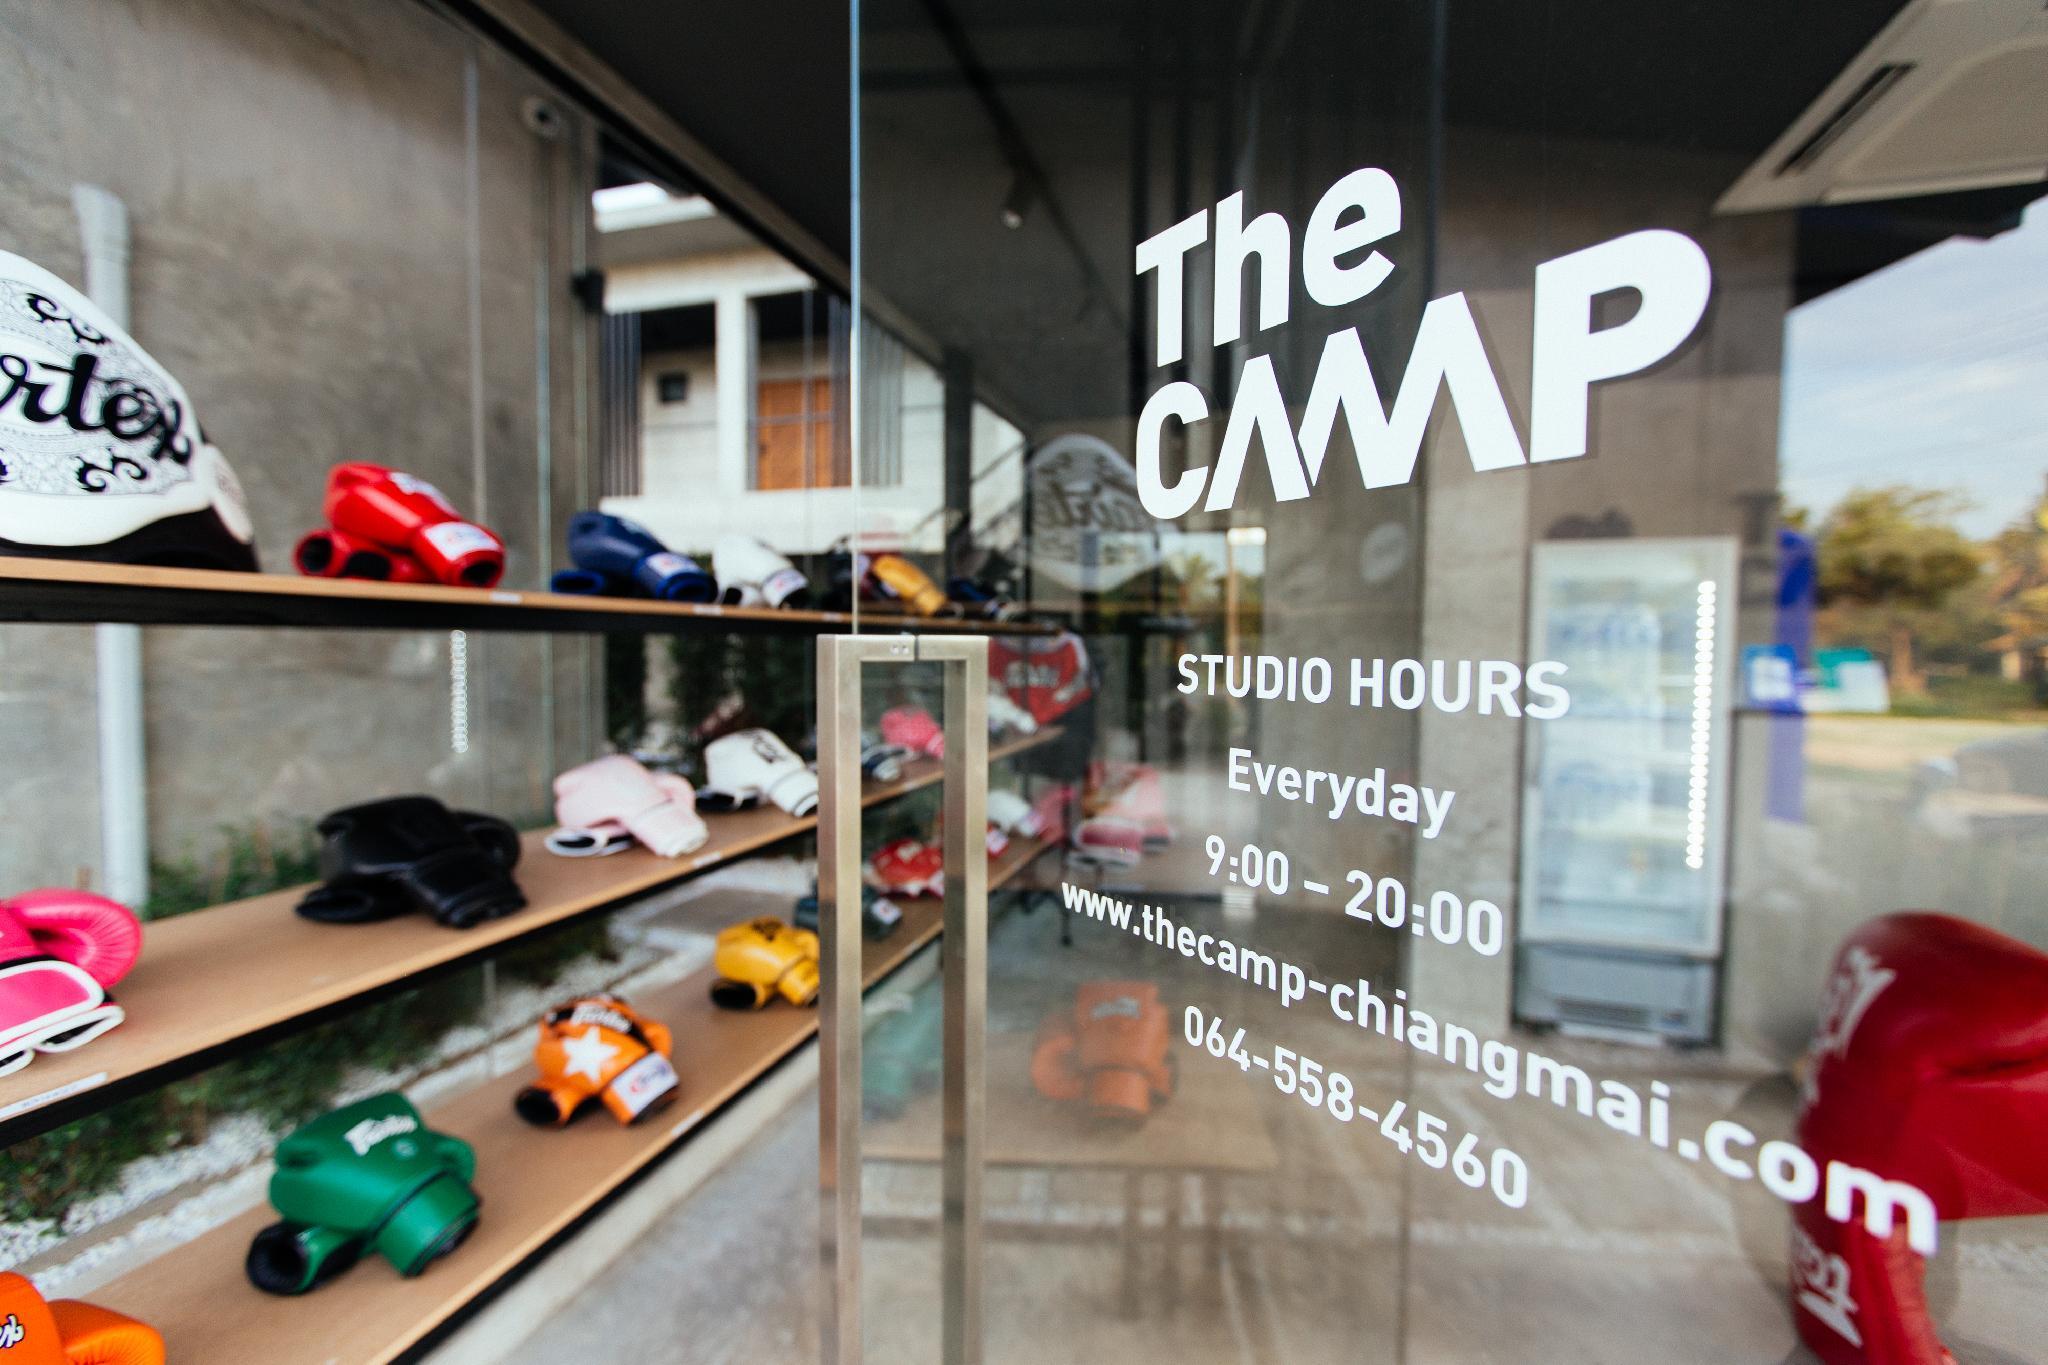 Price The Camp Muay Thai Resort and Academy